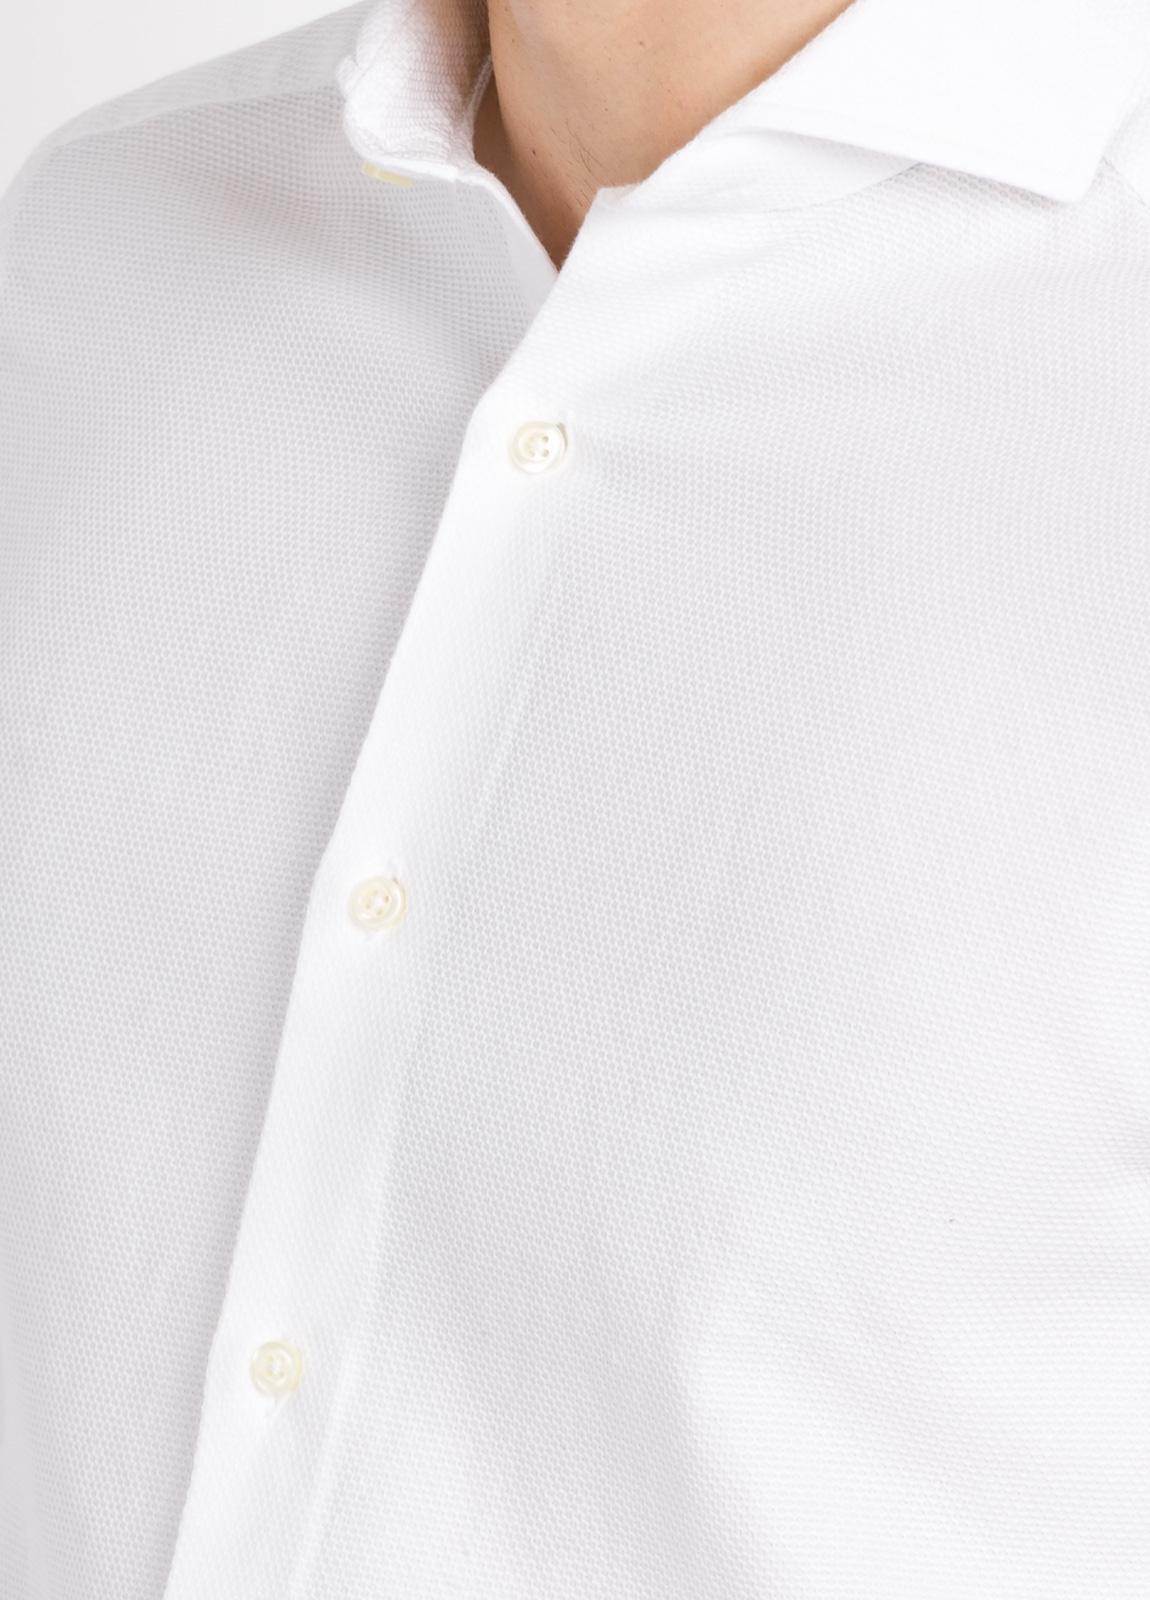 Camisa Leisure Wear SLIM FIT Modelo CAPRI color blanco nido de abeja. 100% Algodón. - Ítem2